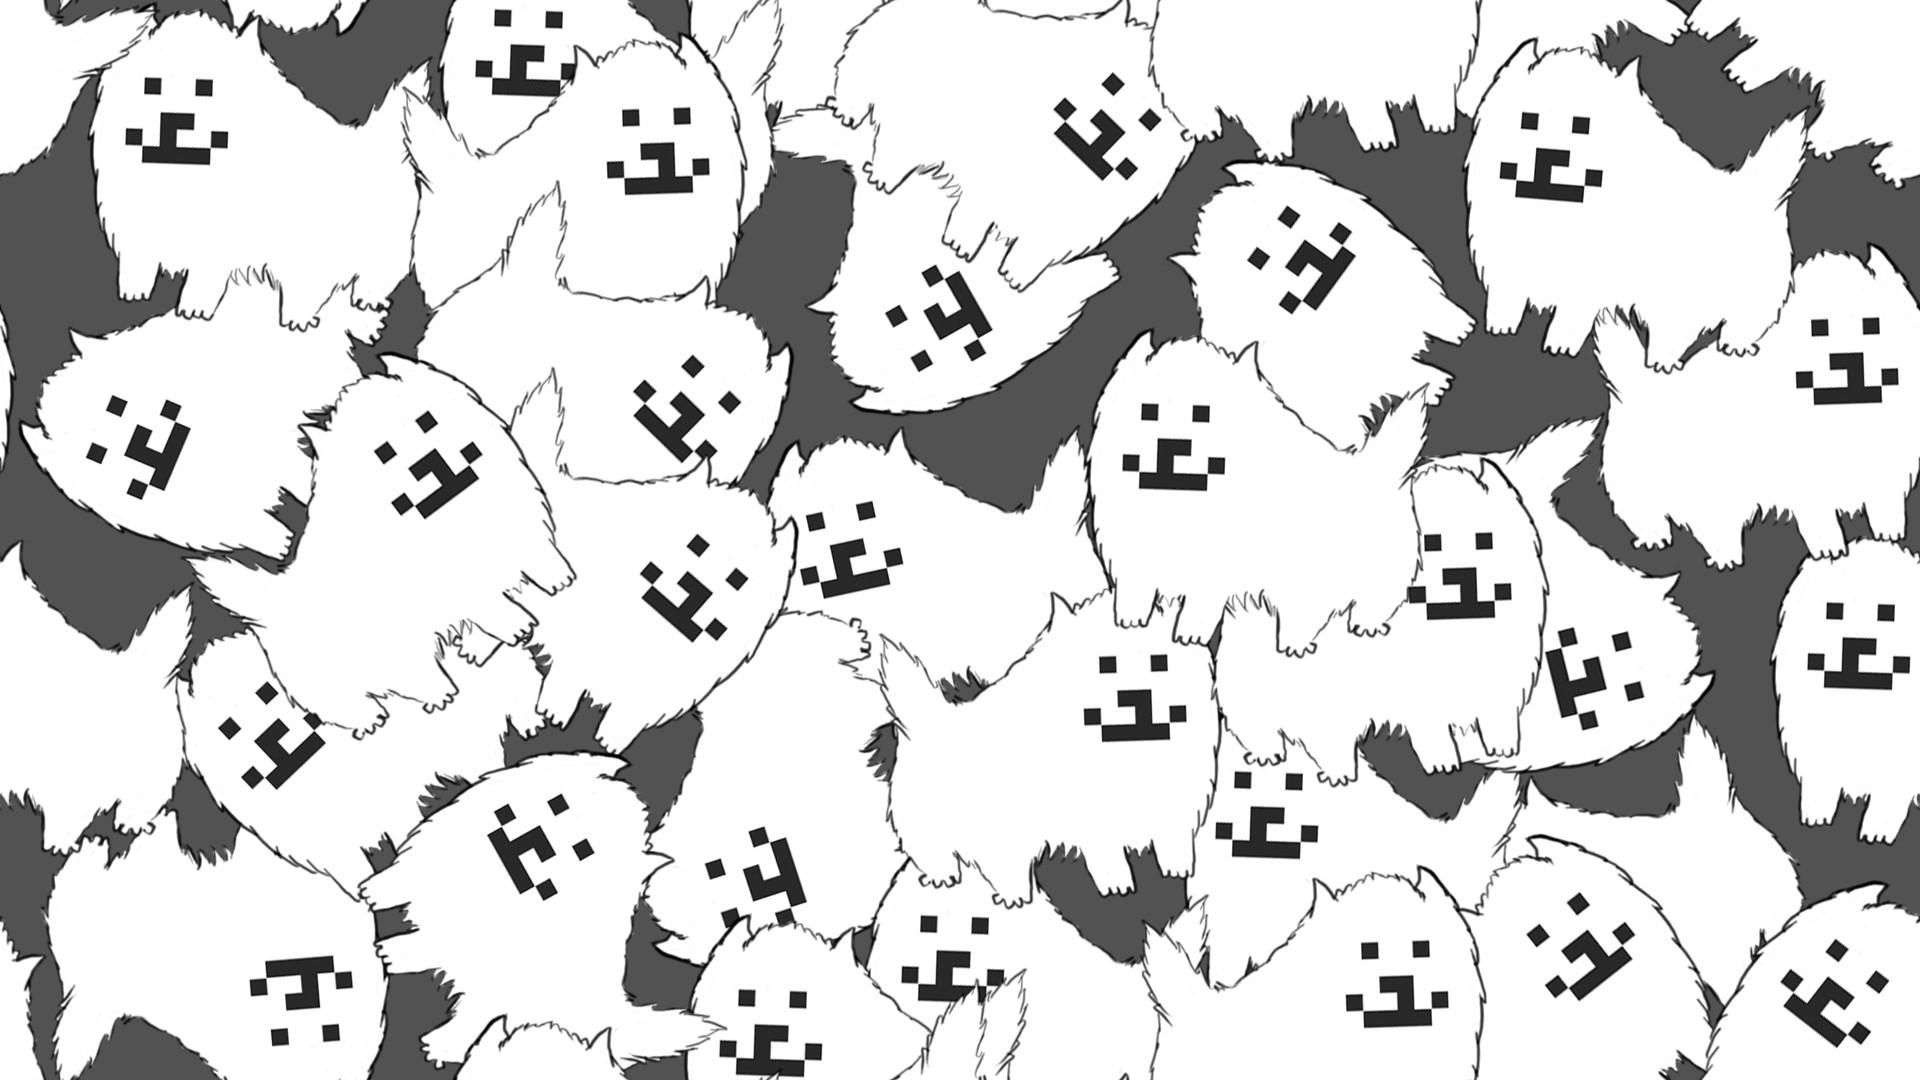 Tile-able dog wallpaper I made …